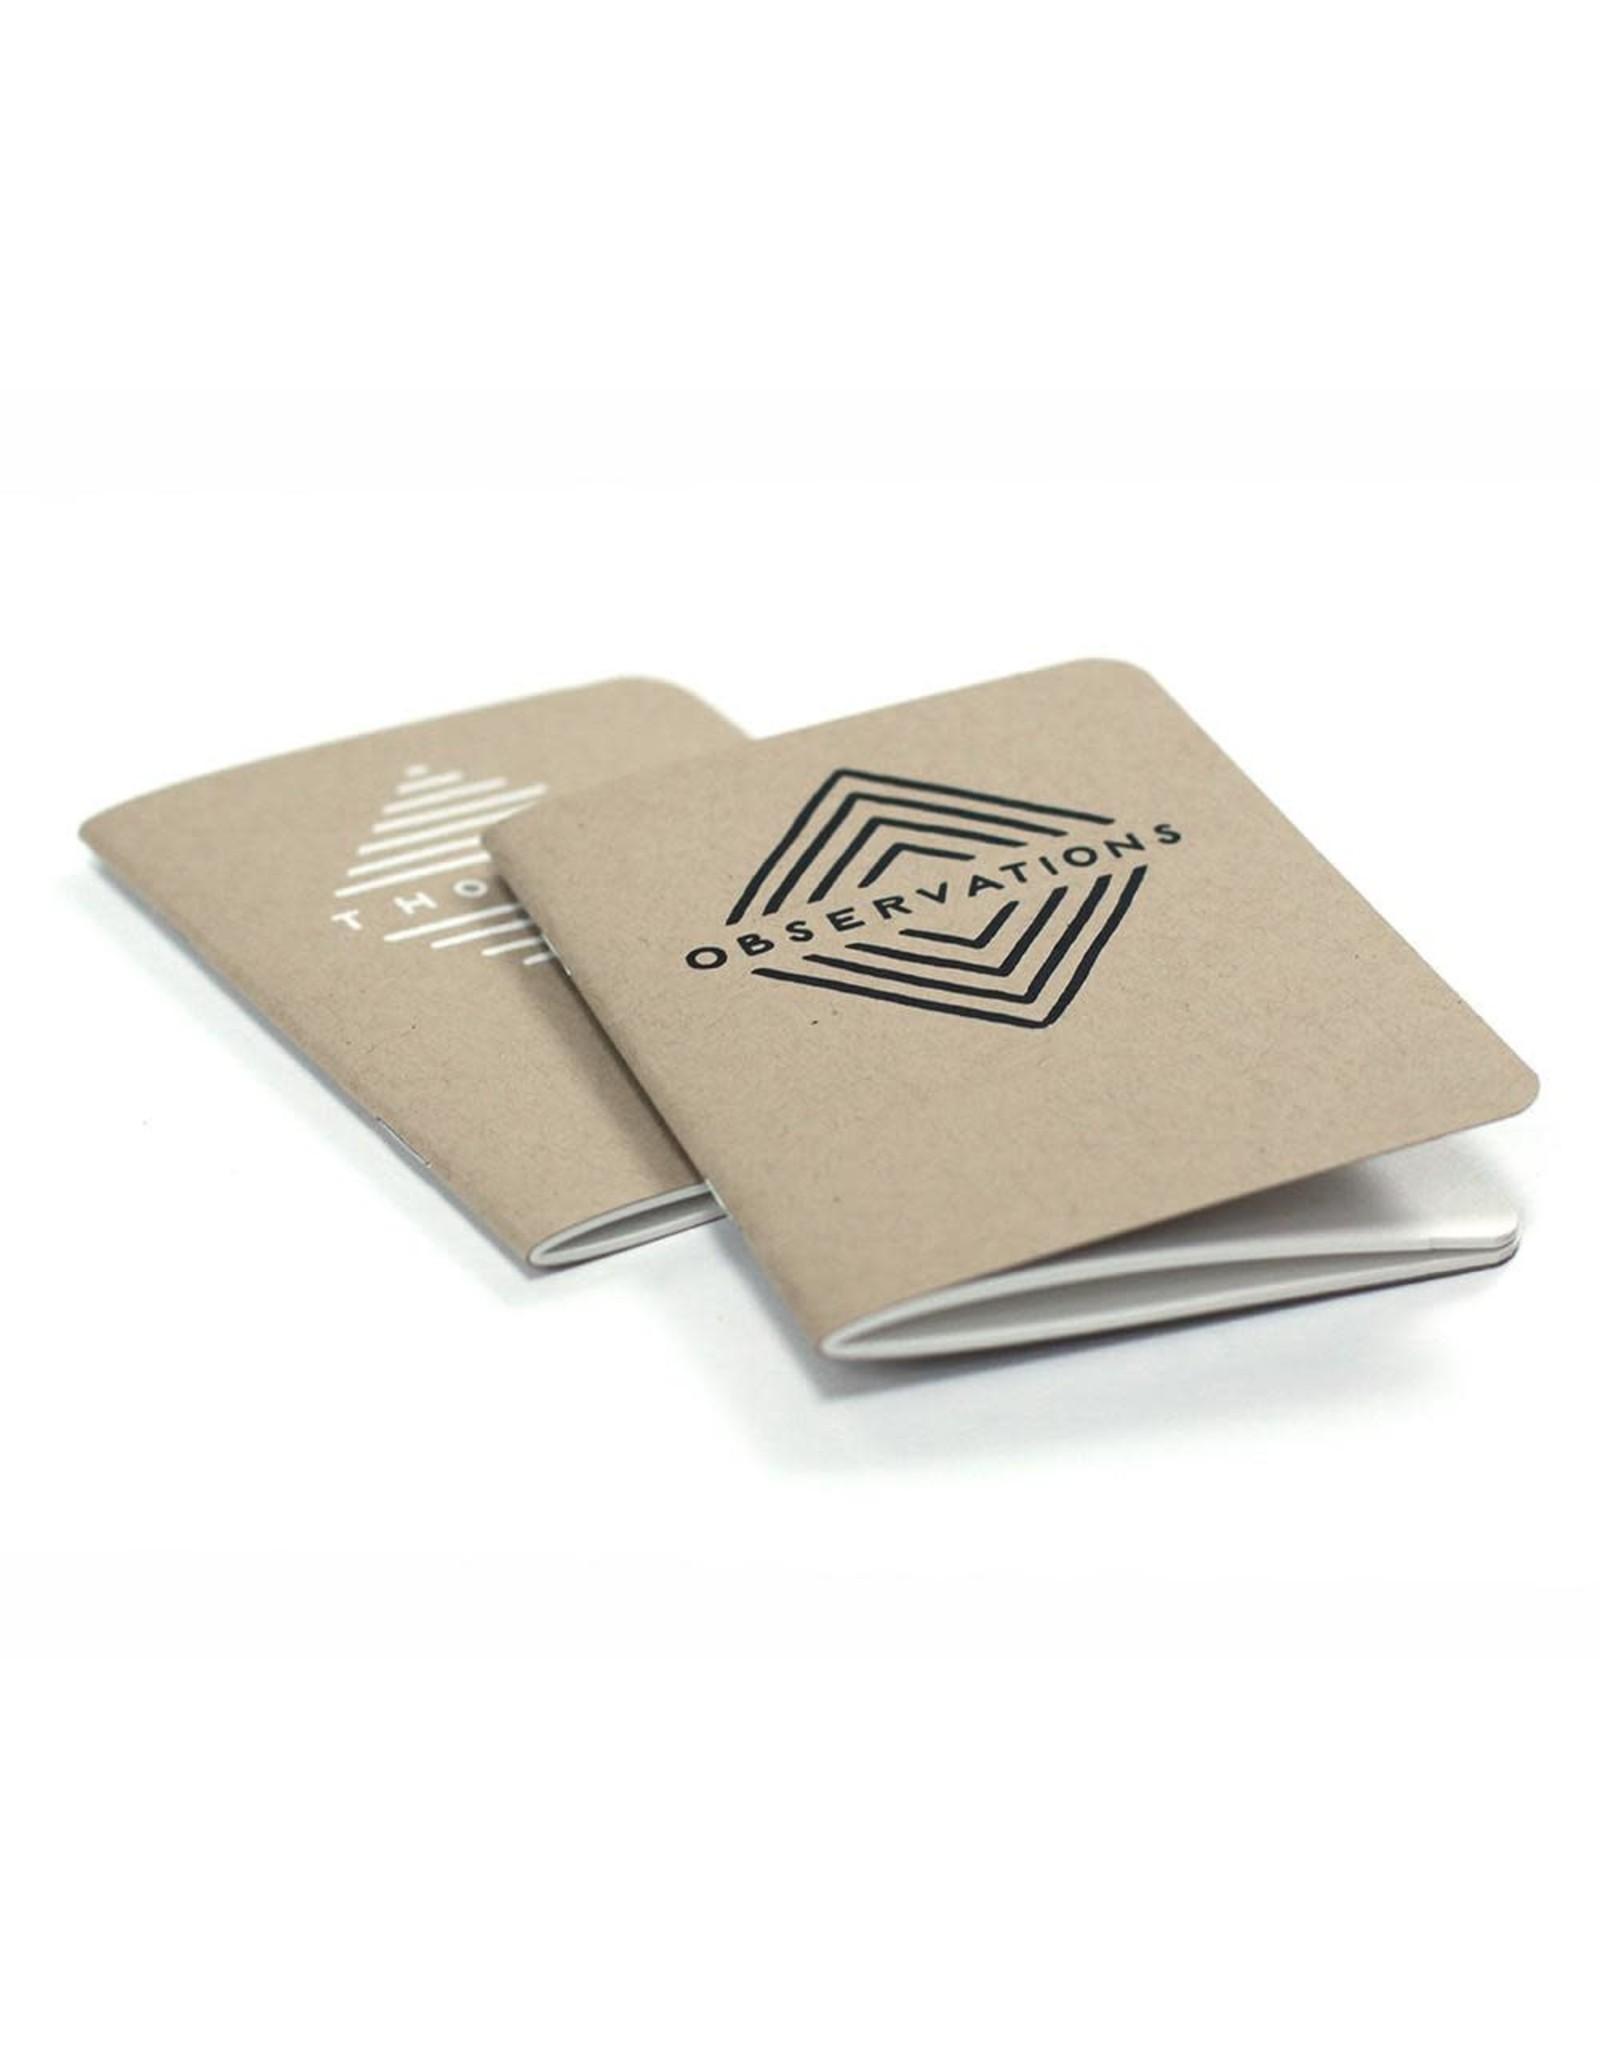 Worthwhile Paper Pocket Journal Set - Thoughts & Observations